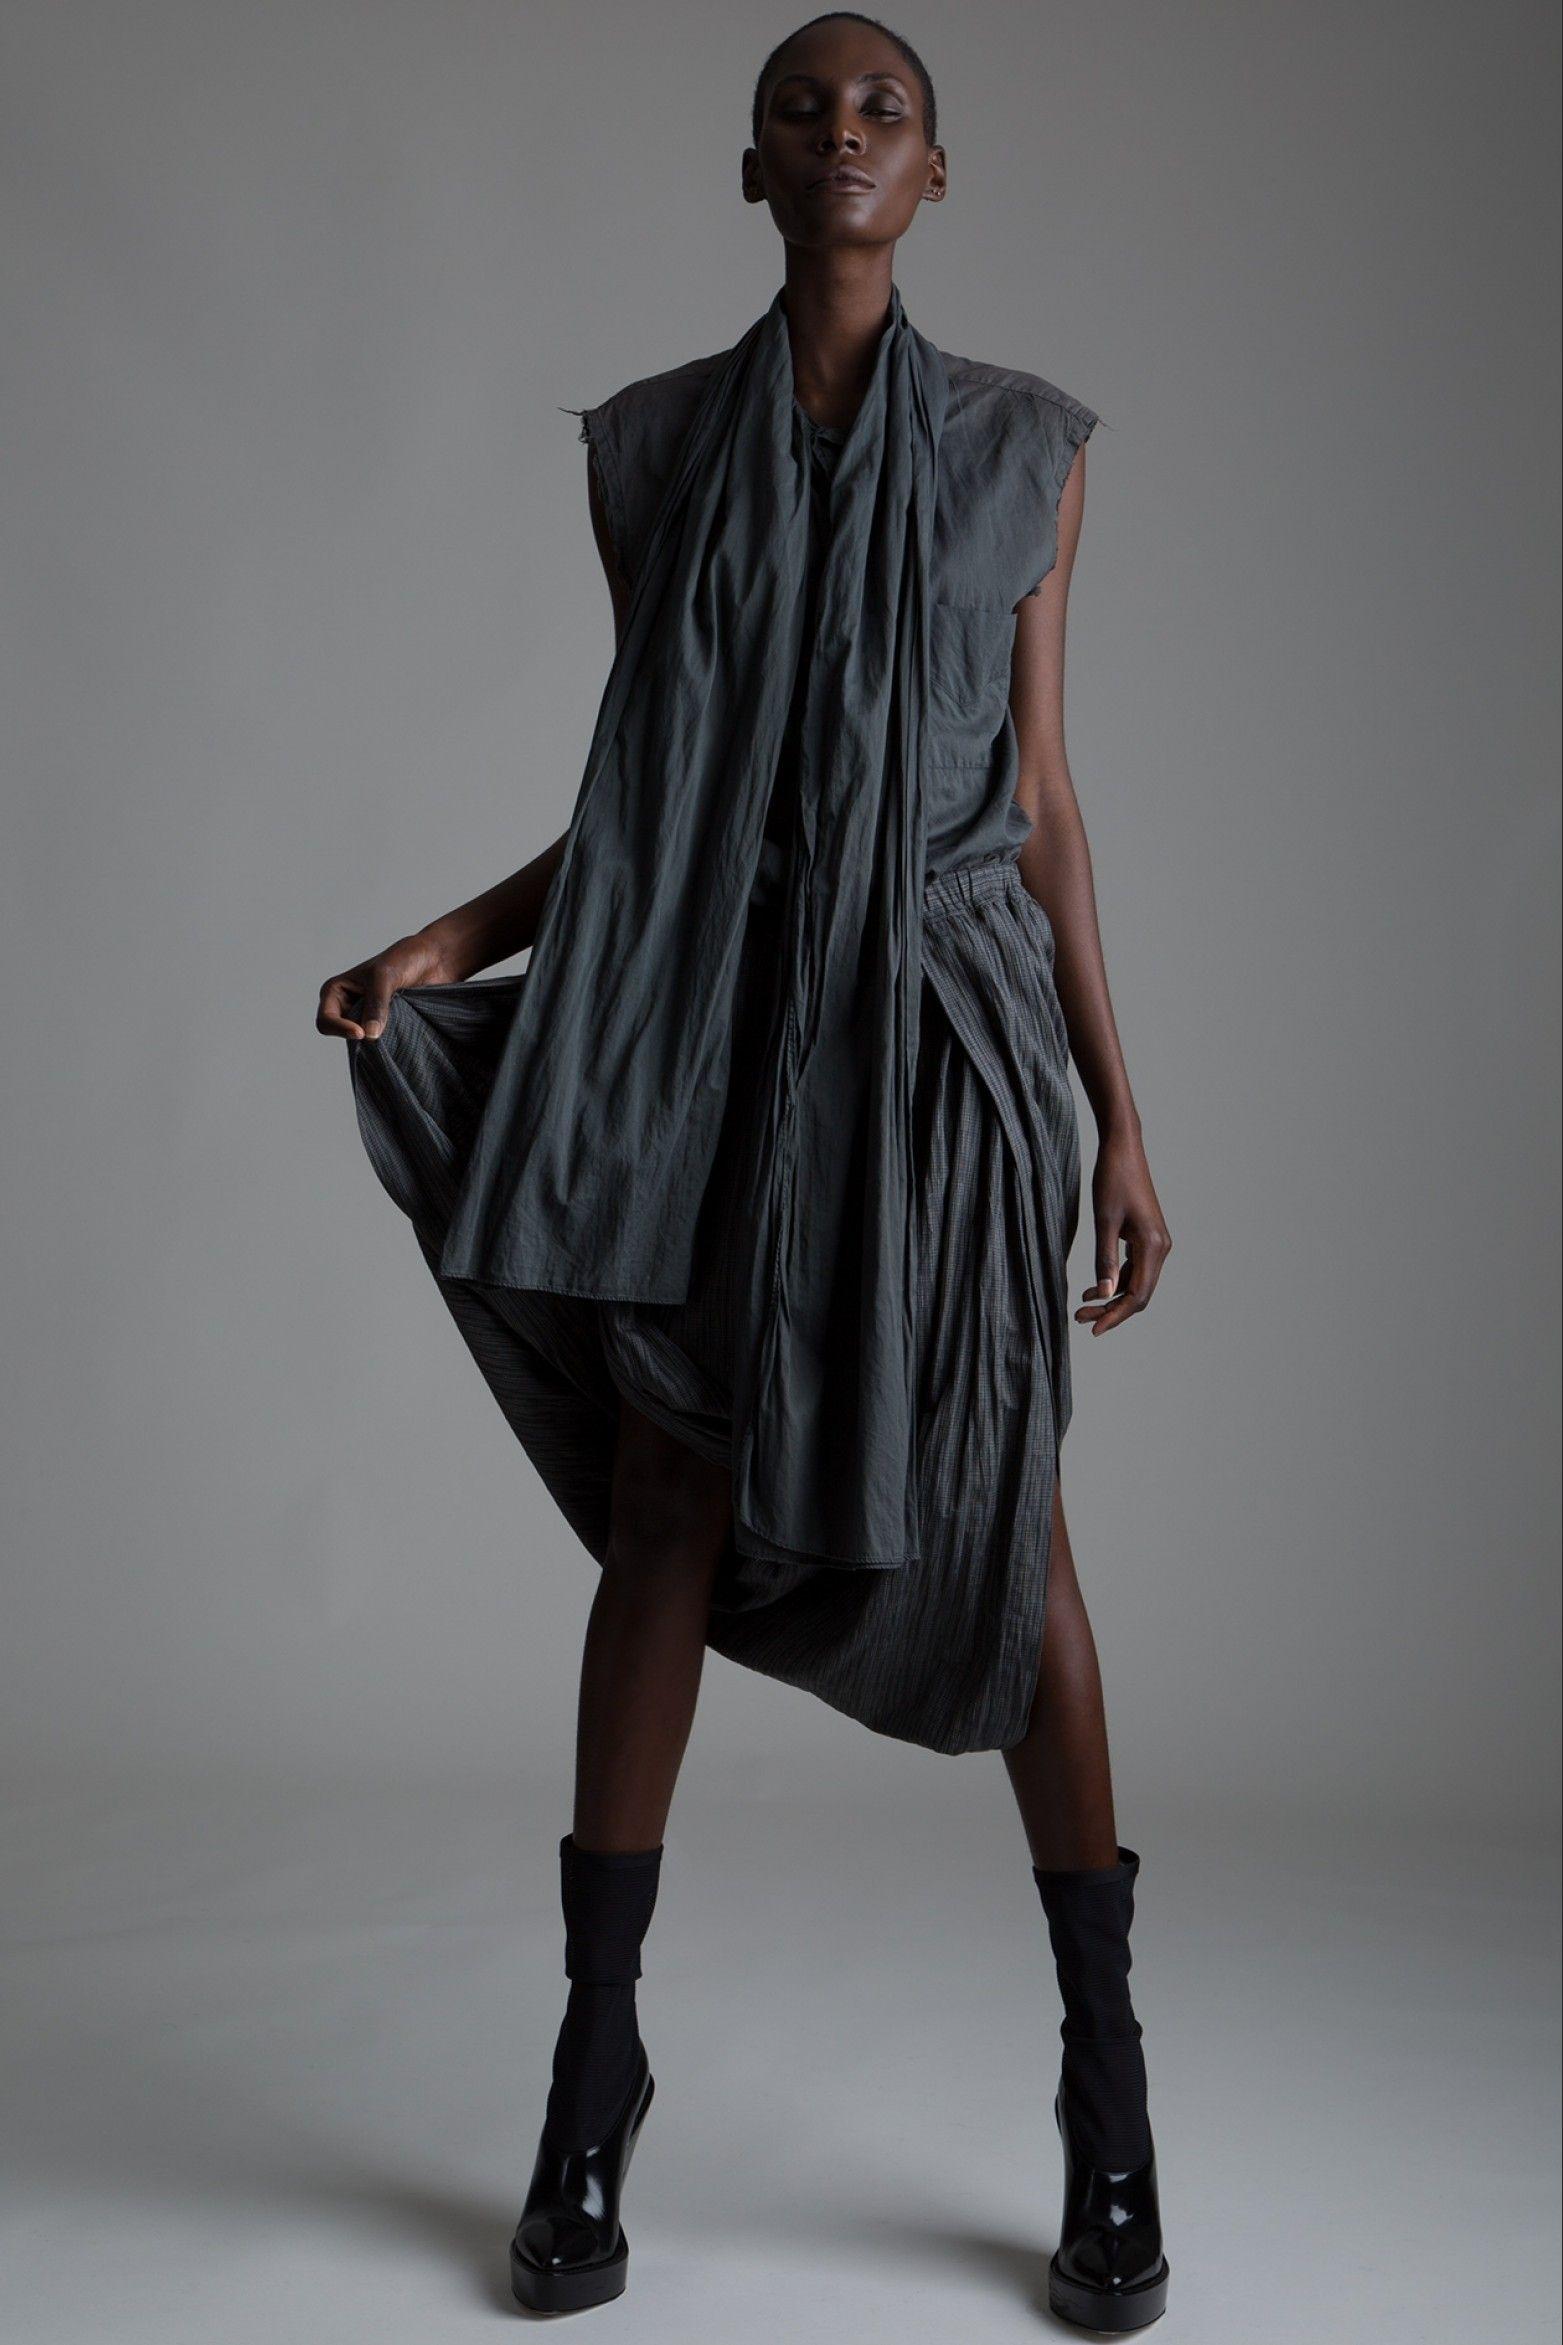 vintage pleasure principle shirt and issey miyake skirt